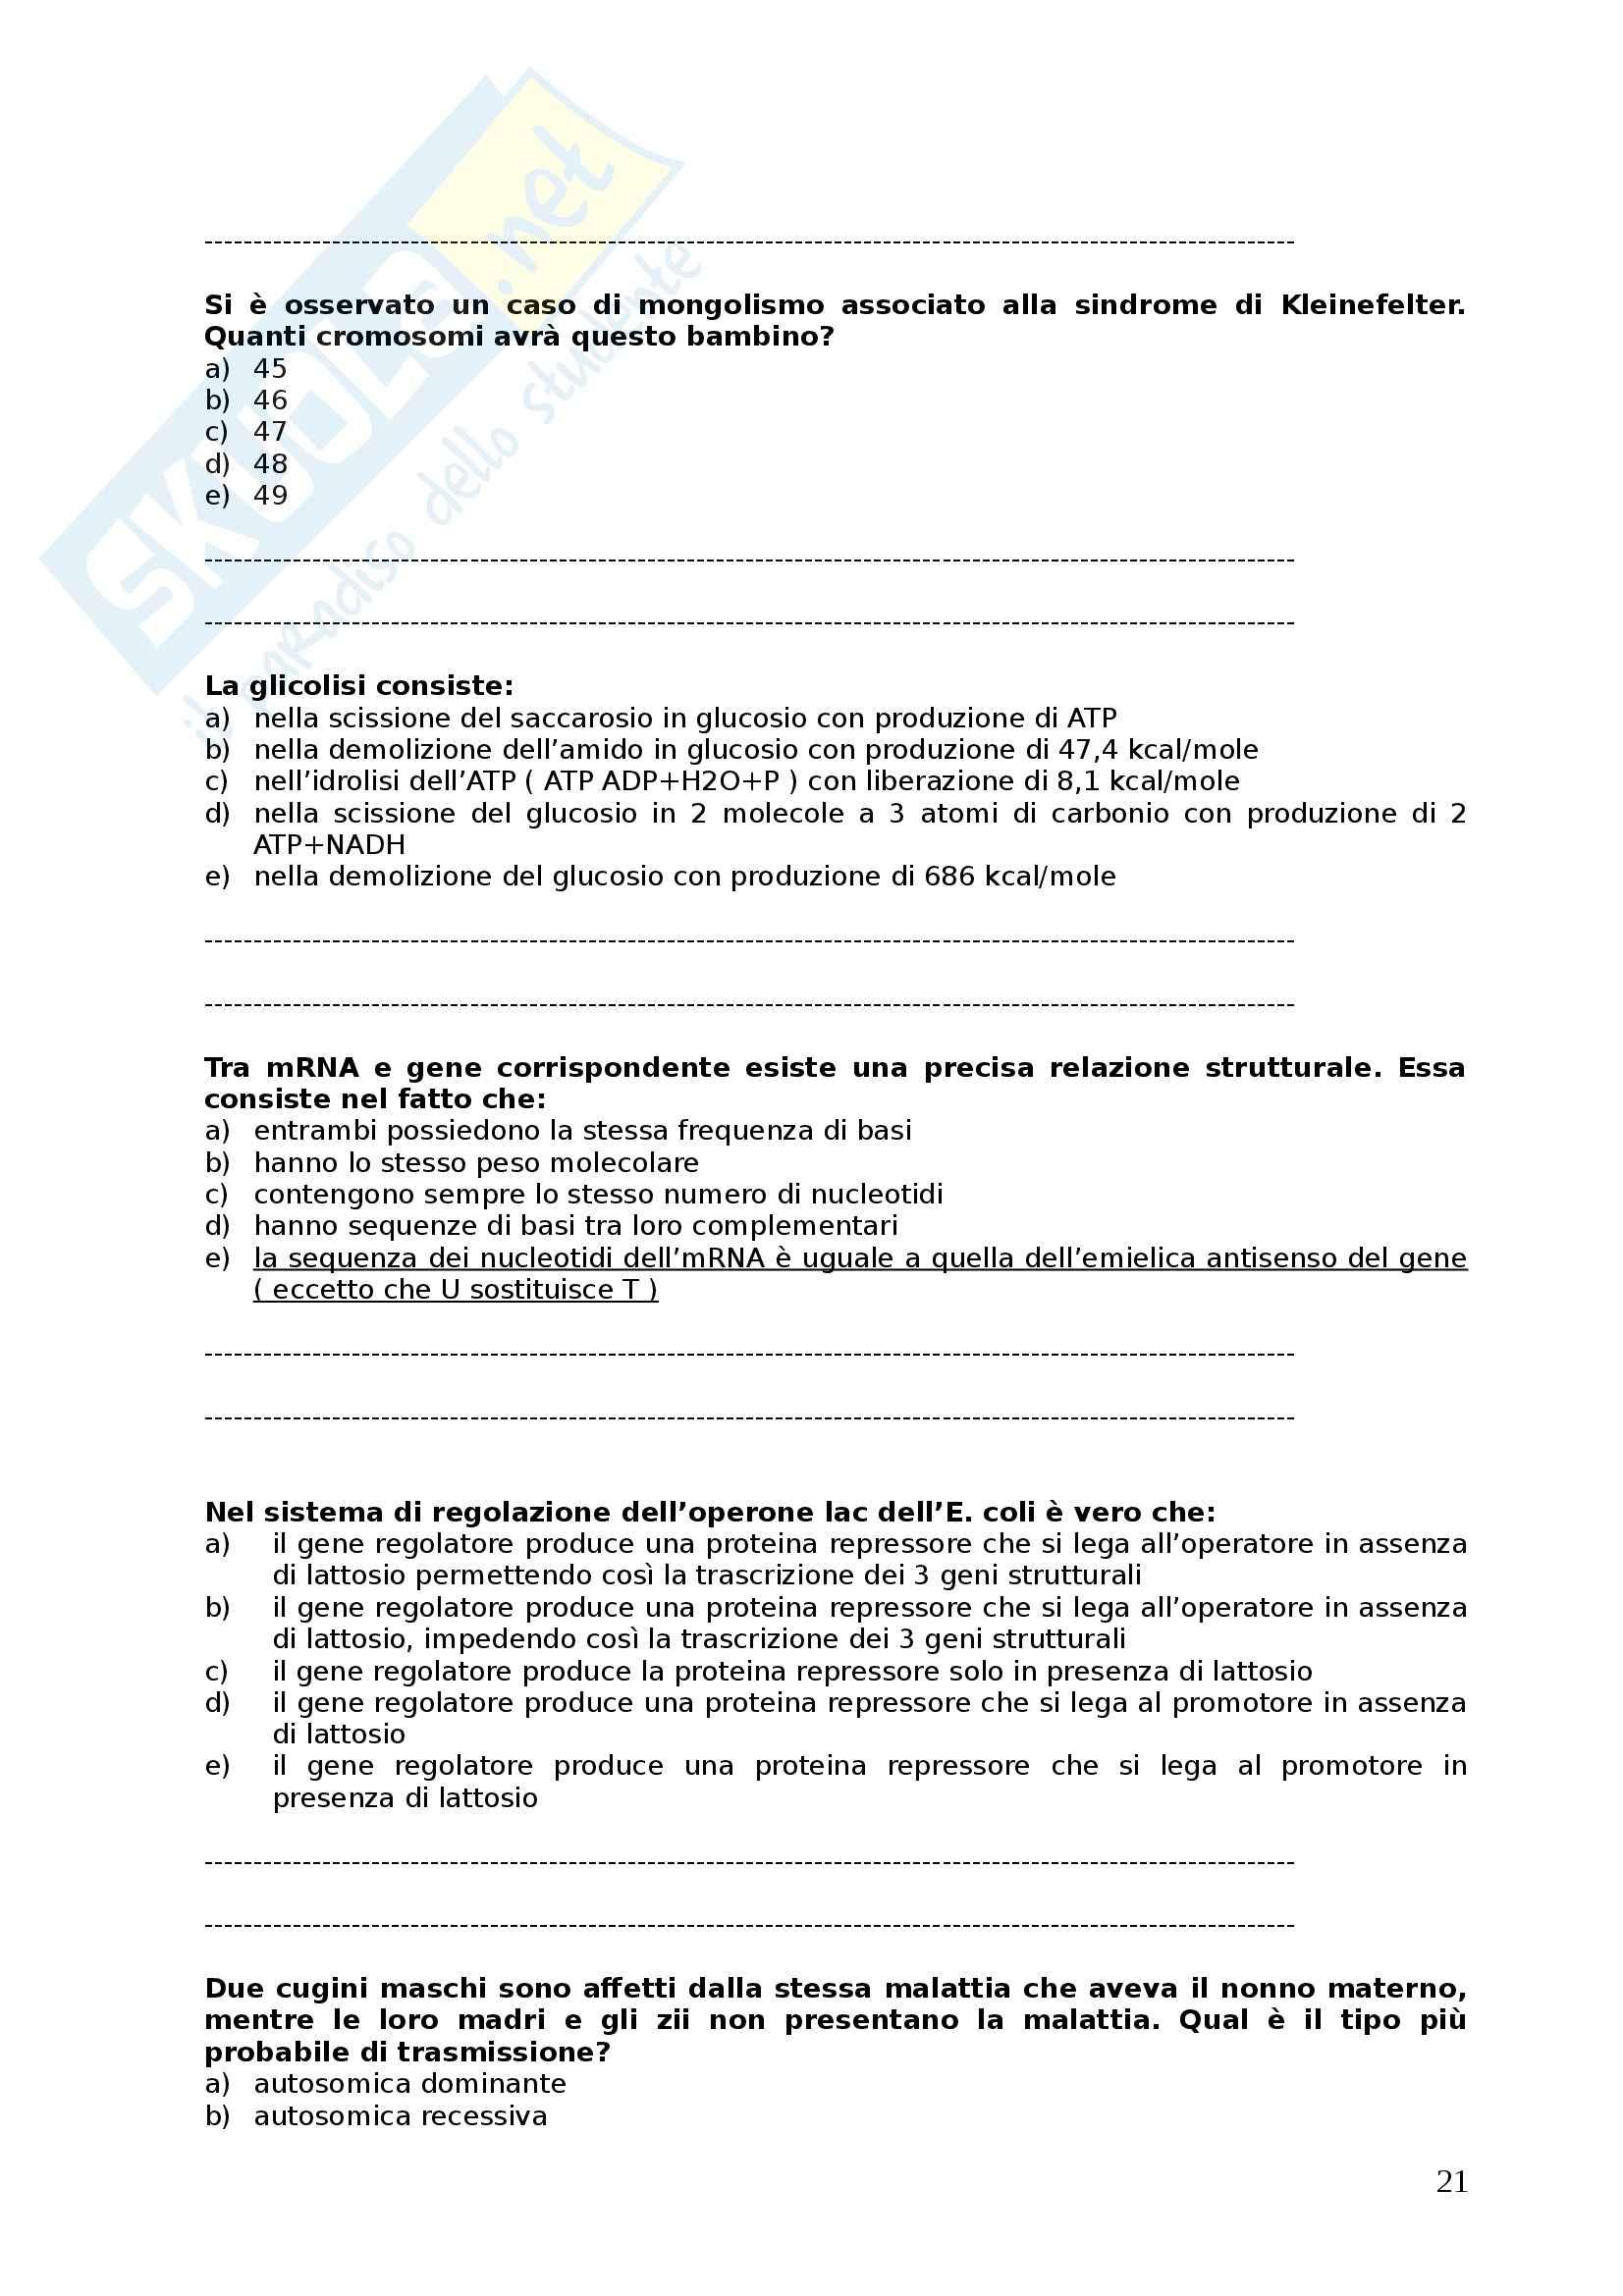 Biologia generale - Domande Pag. 21